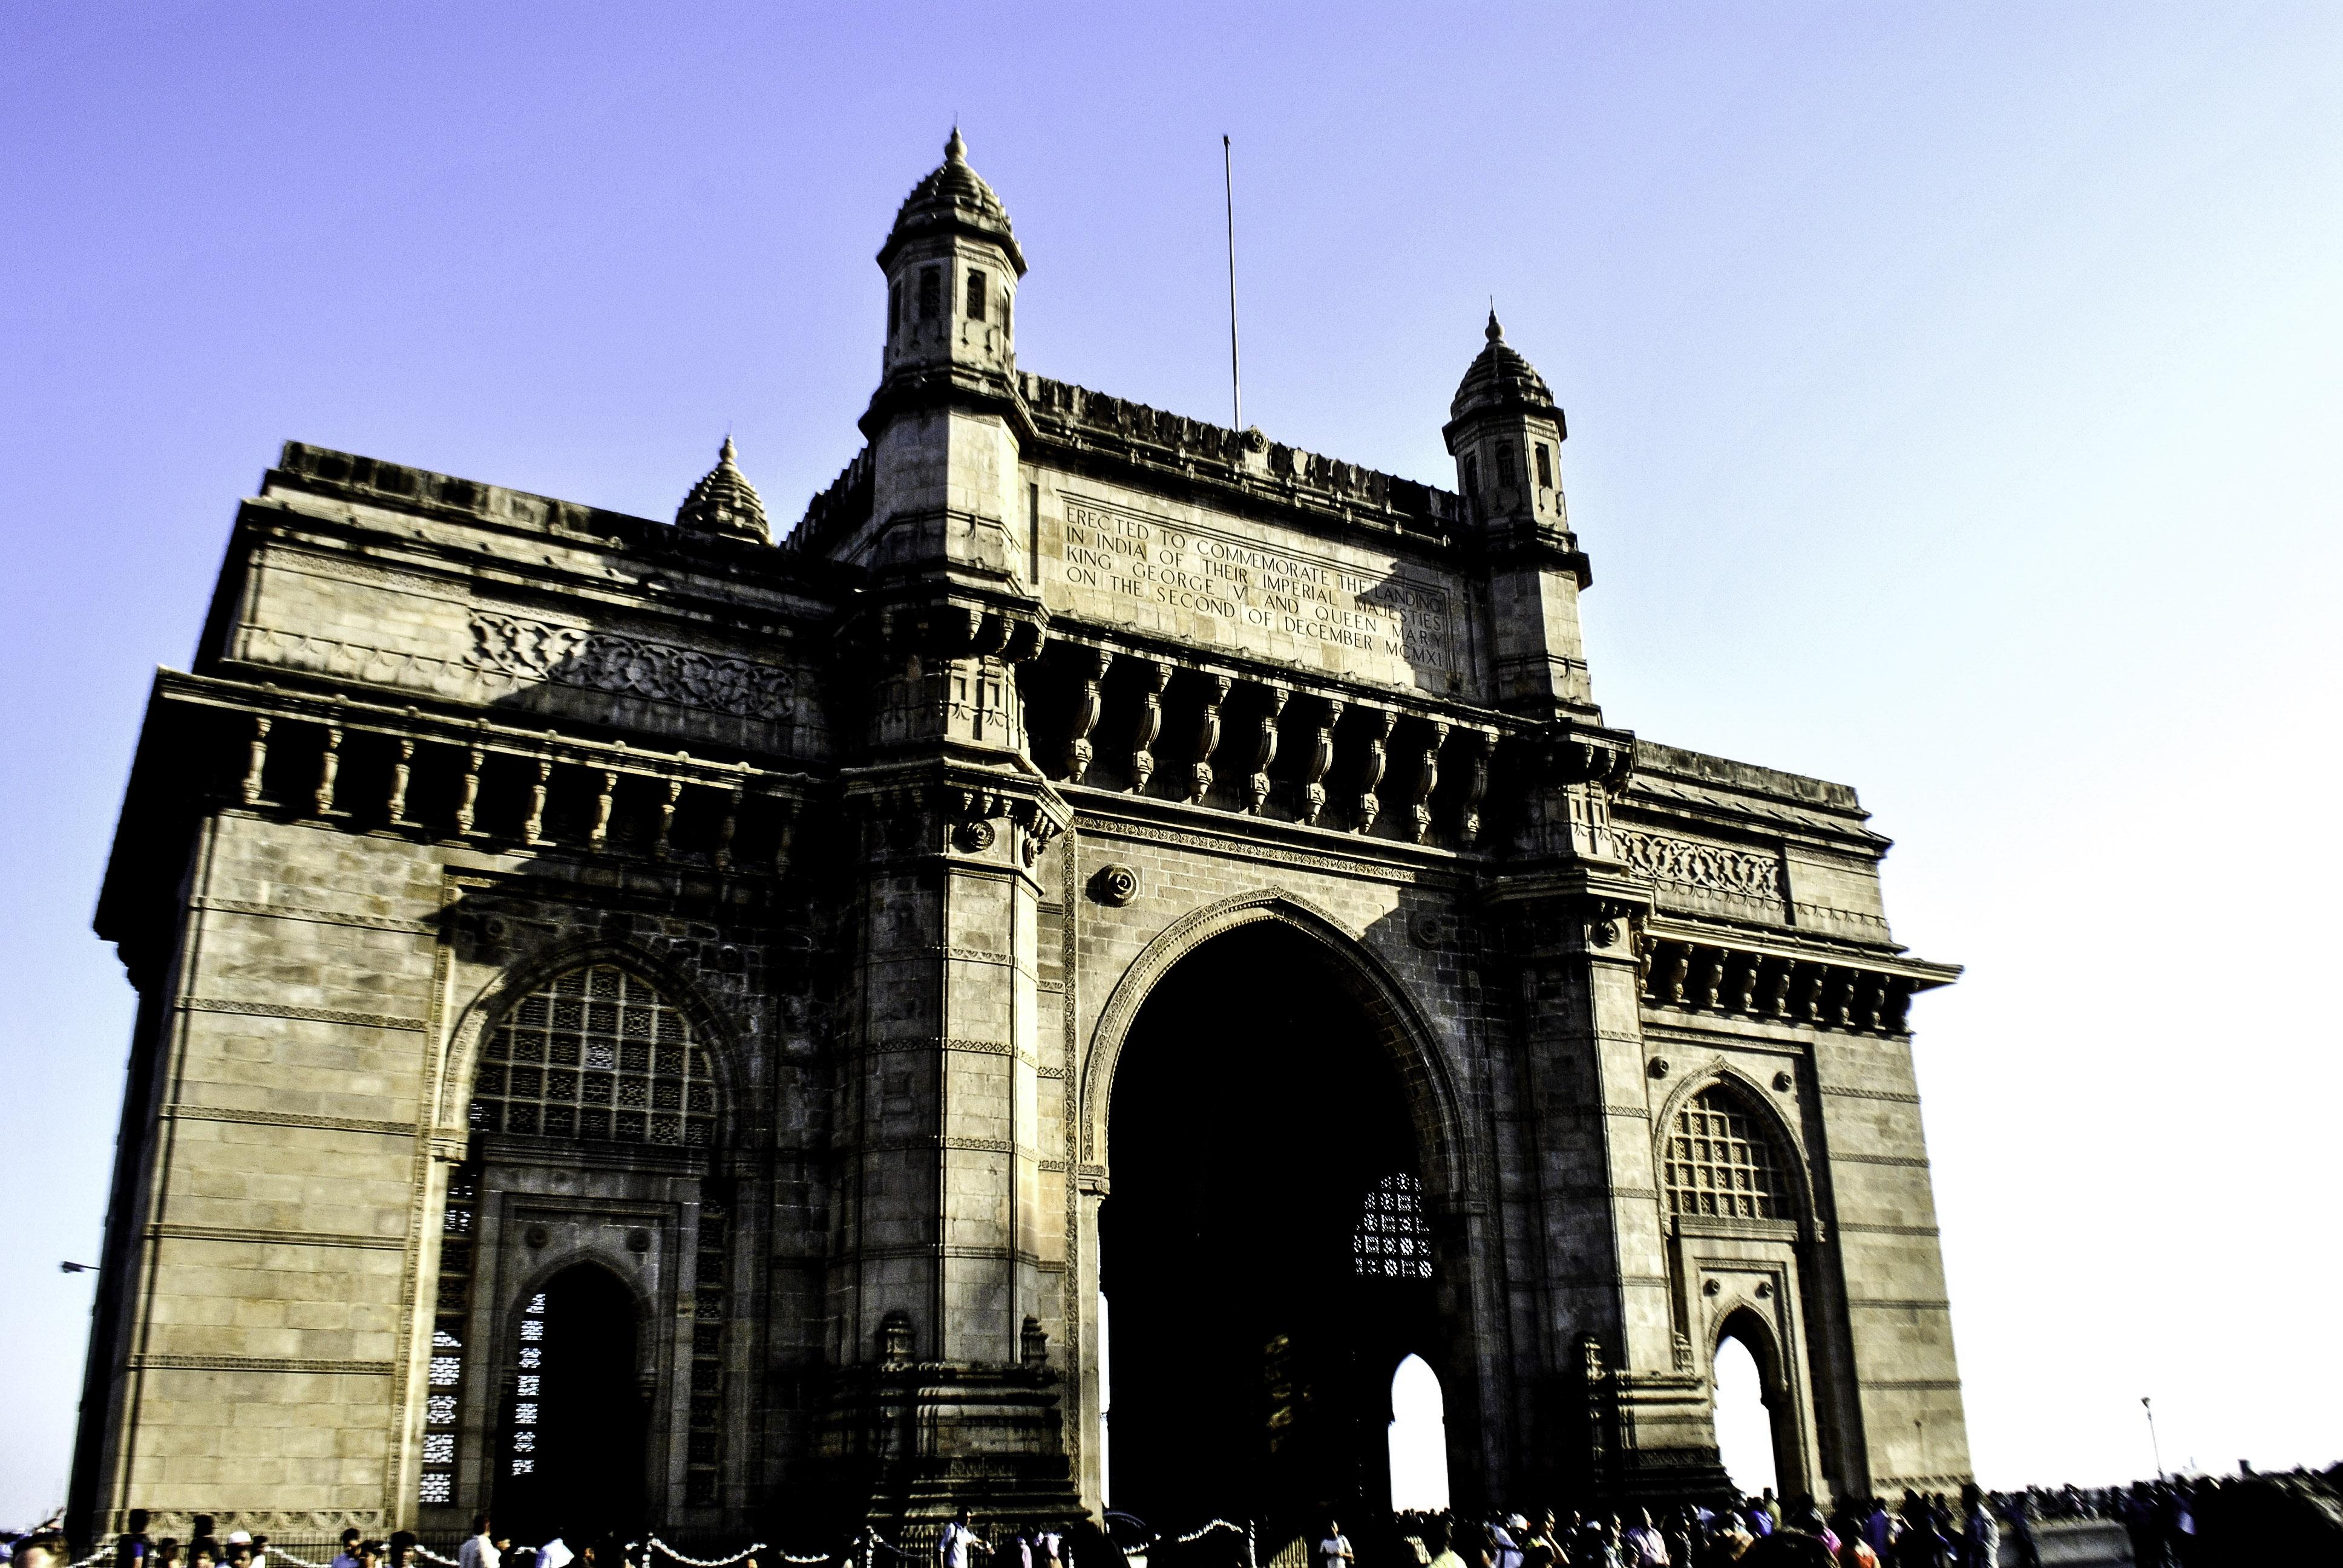 gateway of india mumbai - photo #37